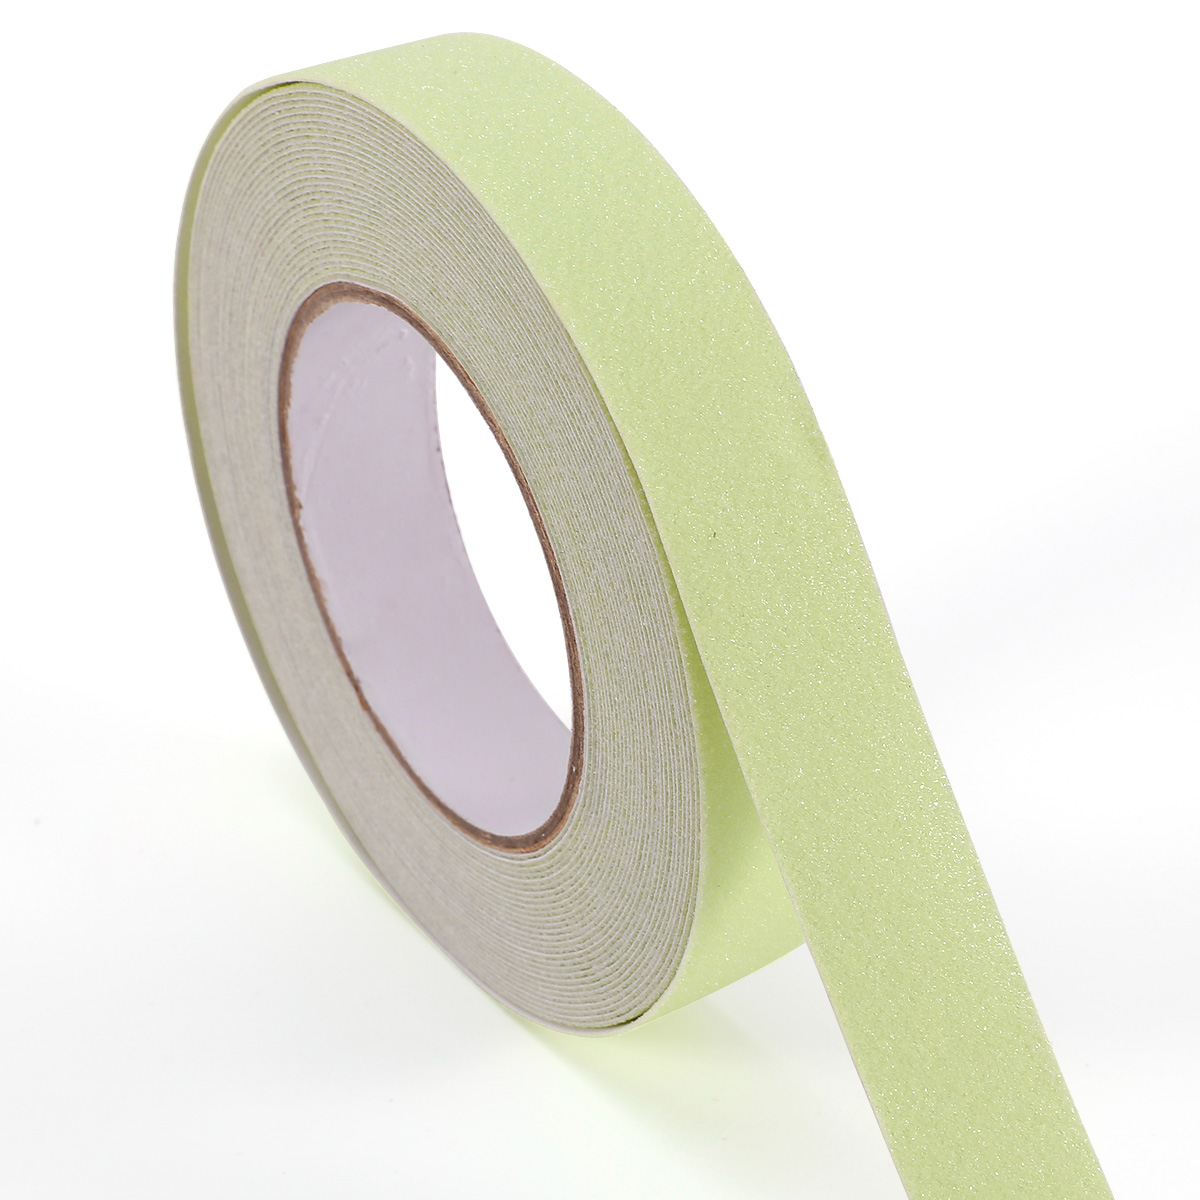 10m High Grip Anti Slip Tape Non Slip Adhesive Backed Tape